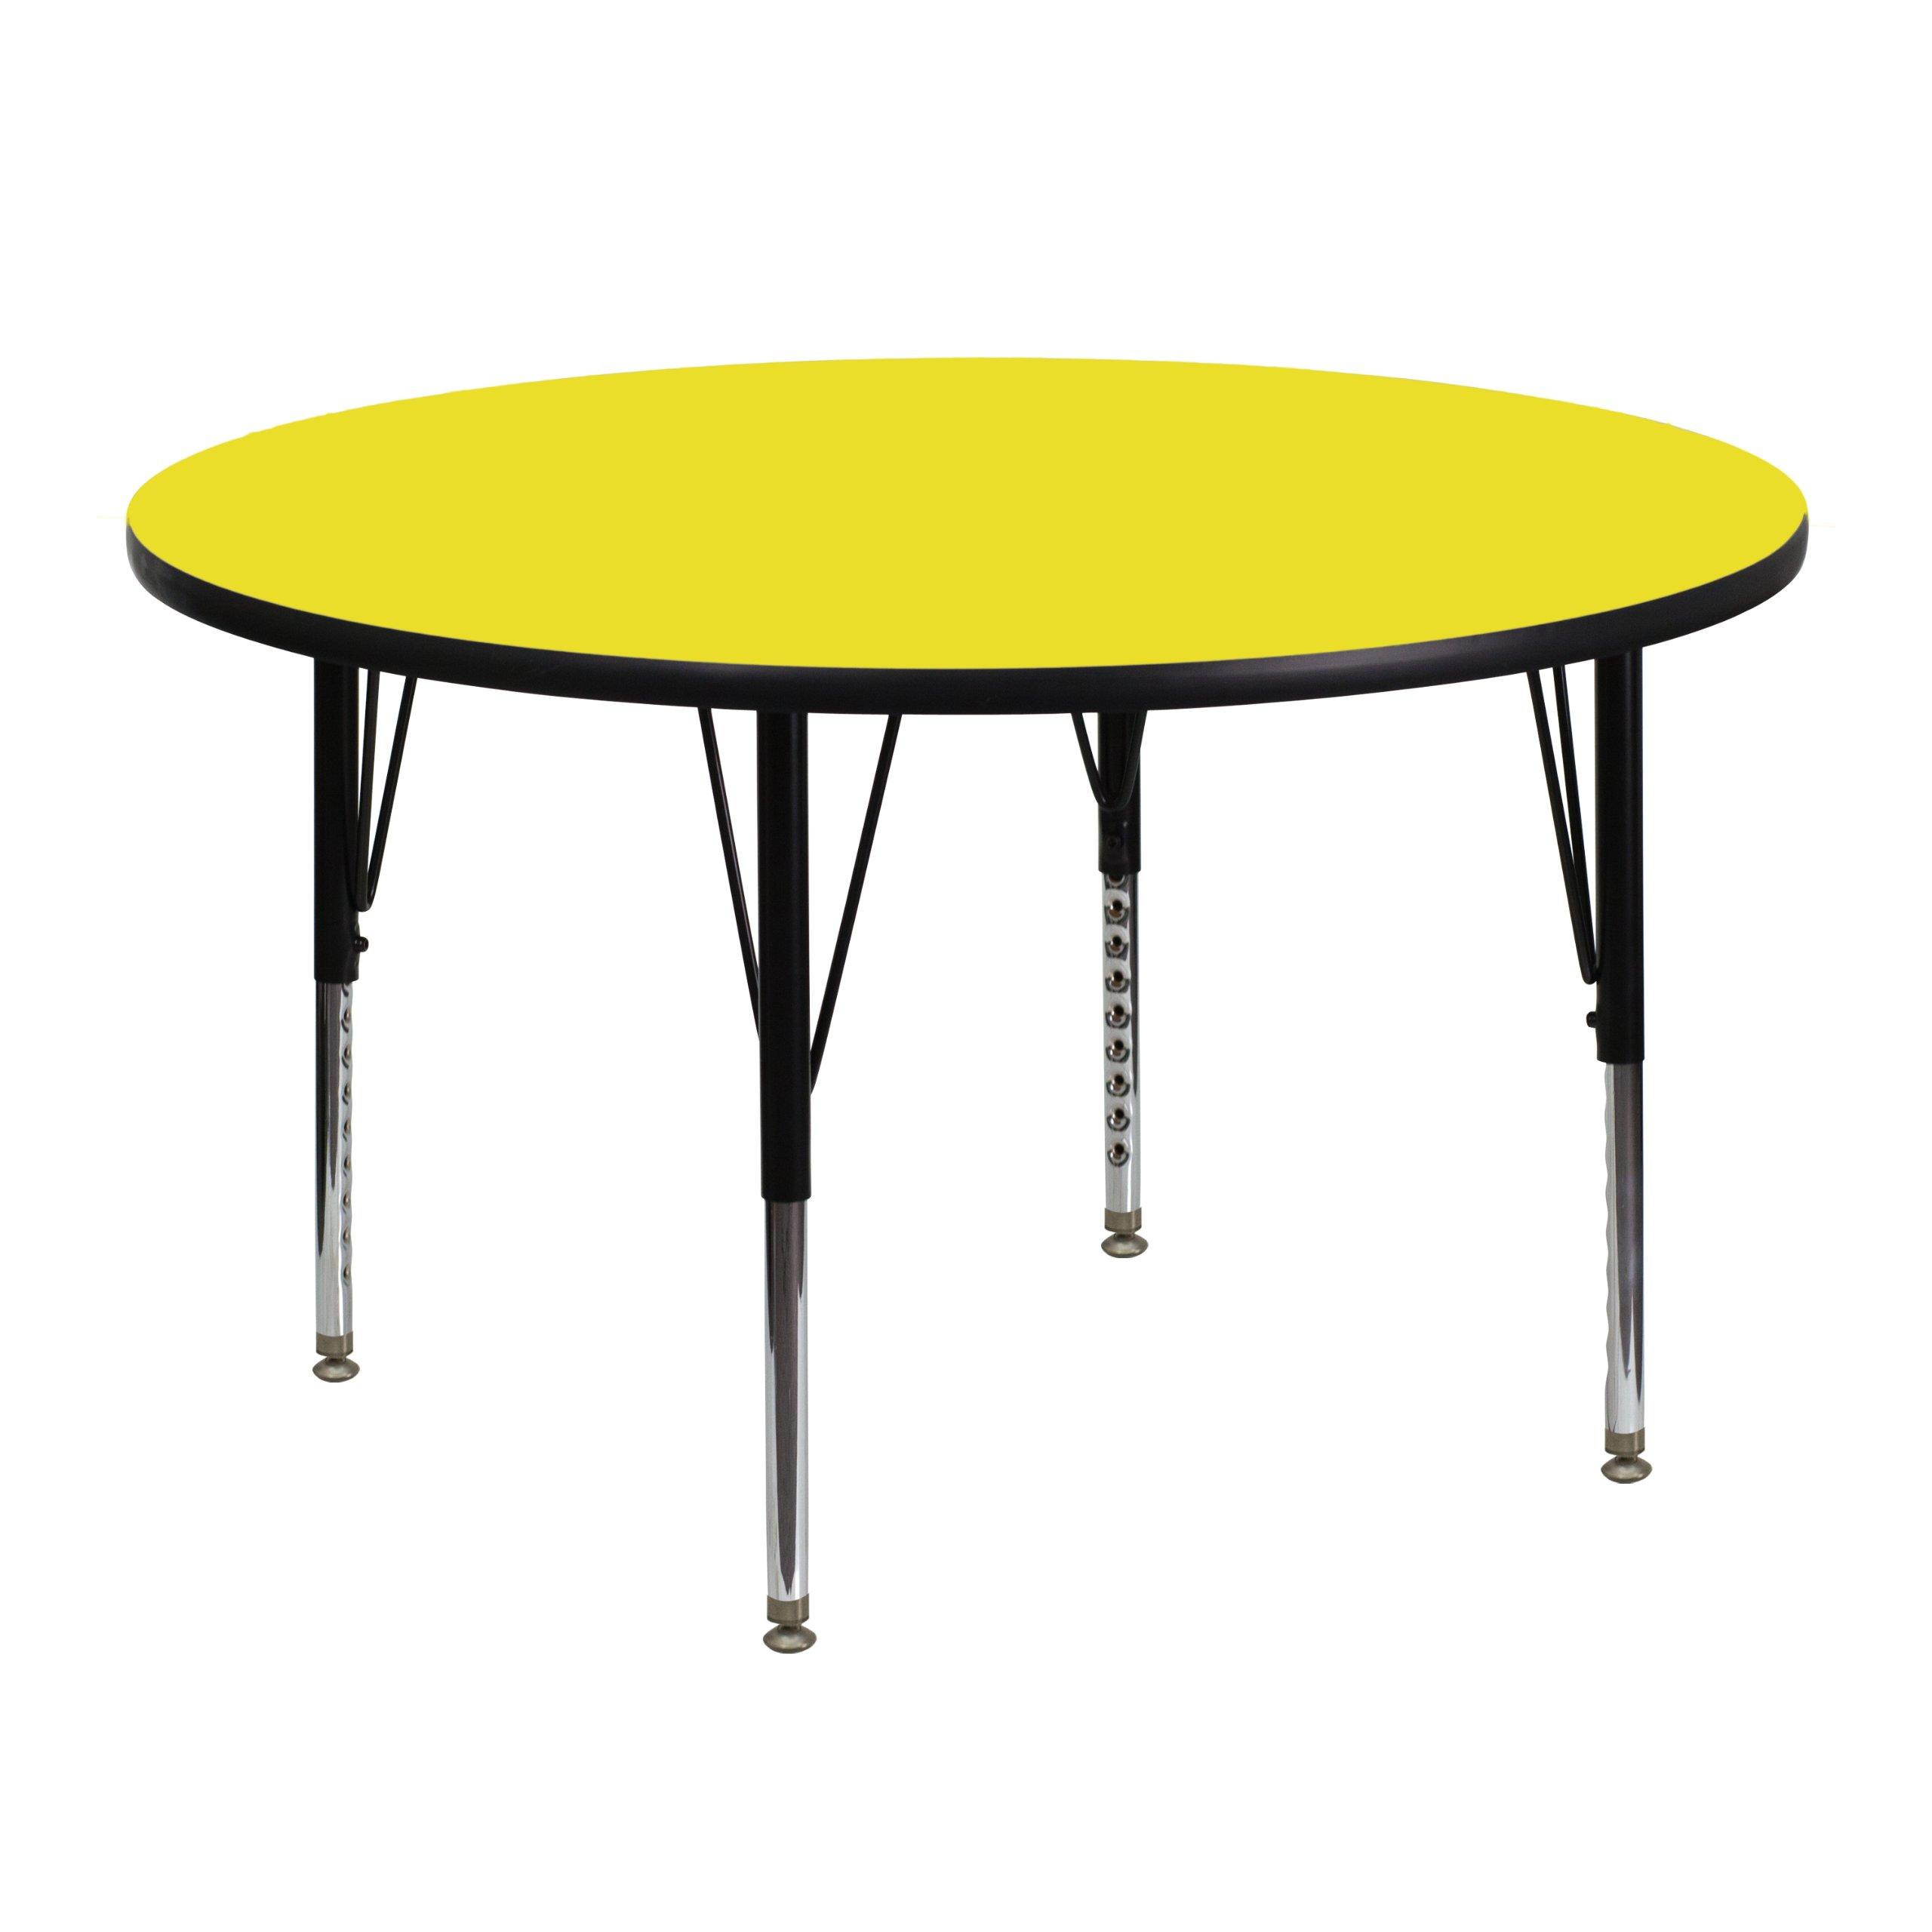 Flash Furniture 48'' Round Yellow HP Laminate Activity Table - Height Adjustable Short Legs